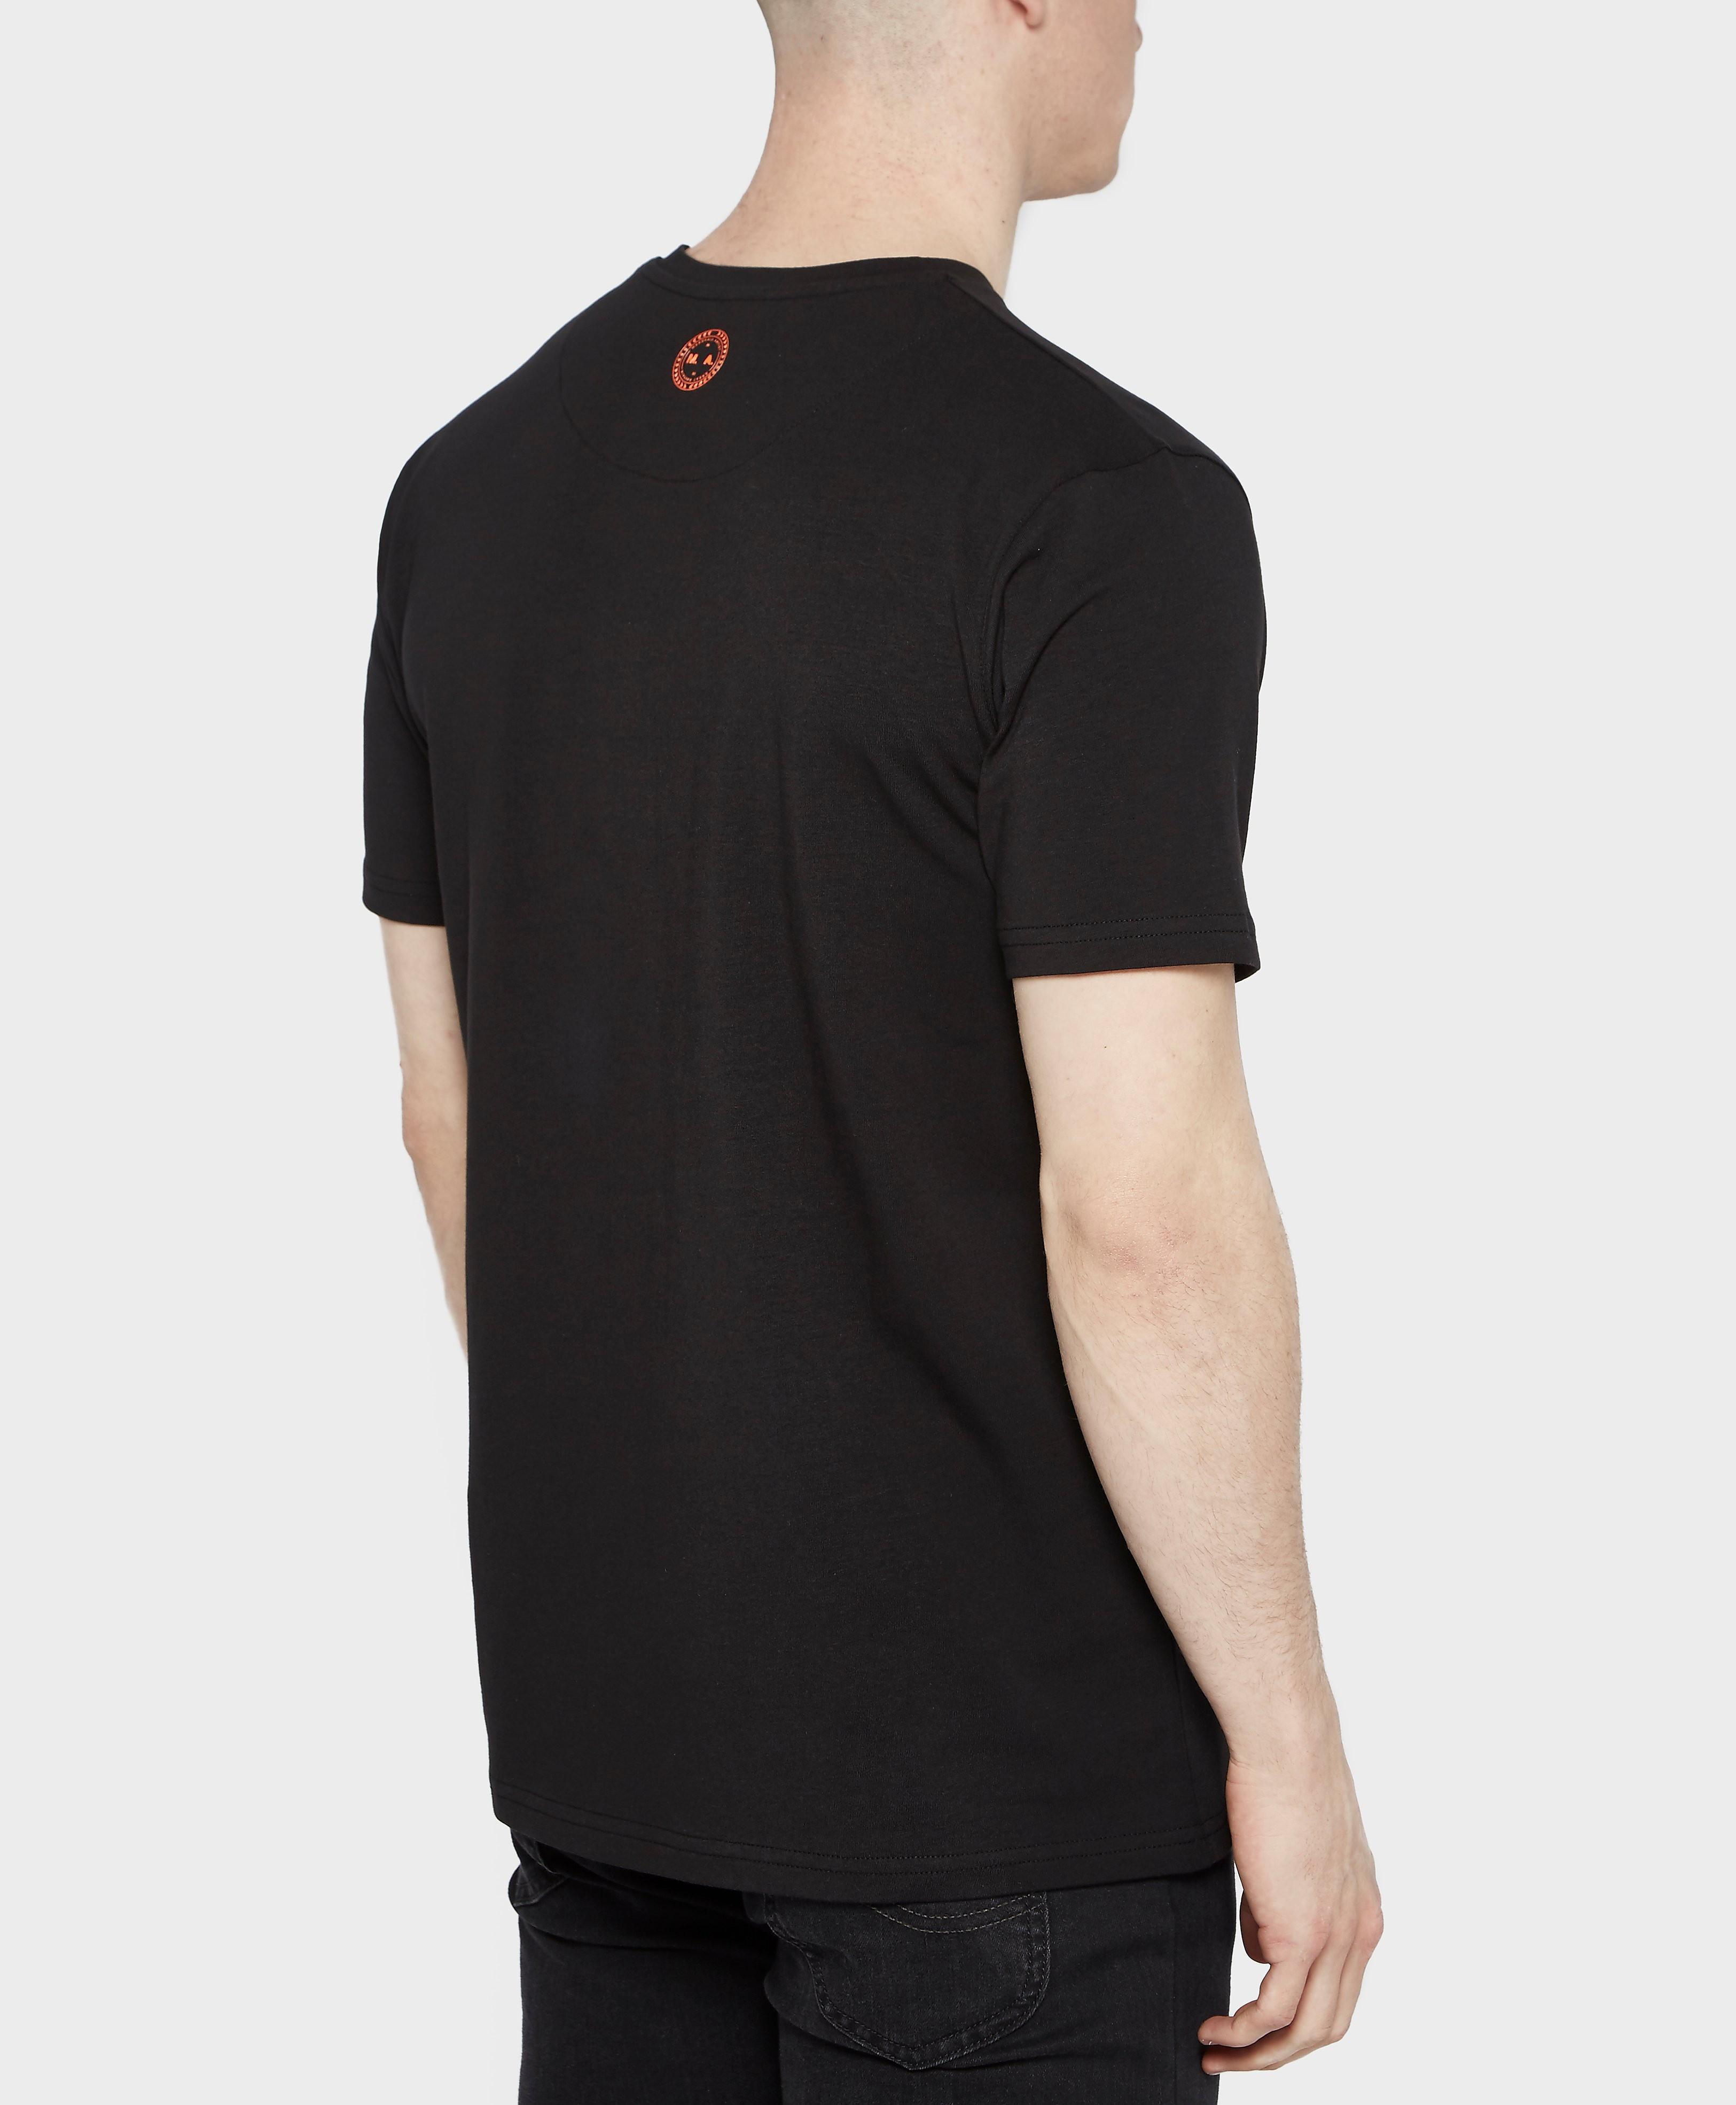 Marshall Artist Disorder T-Shirt